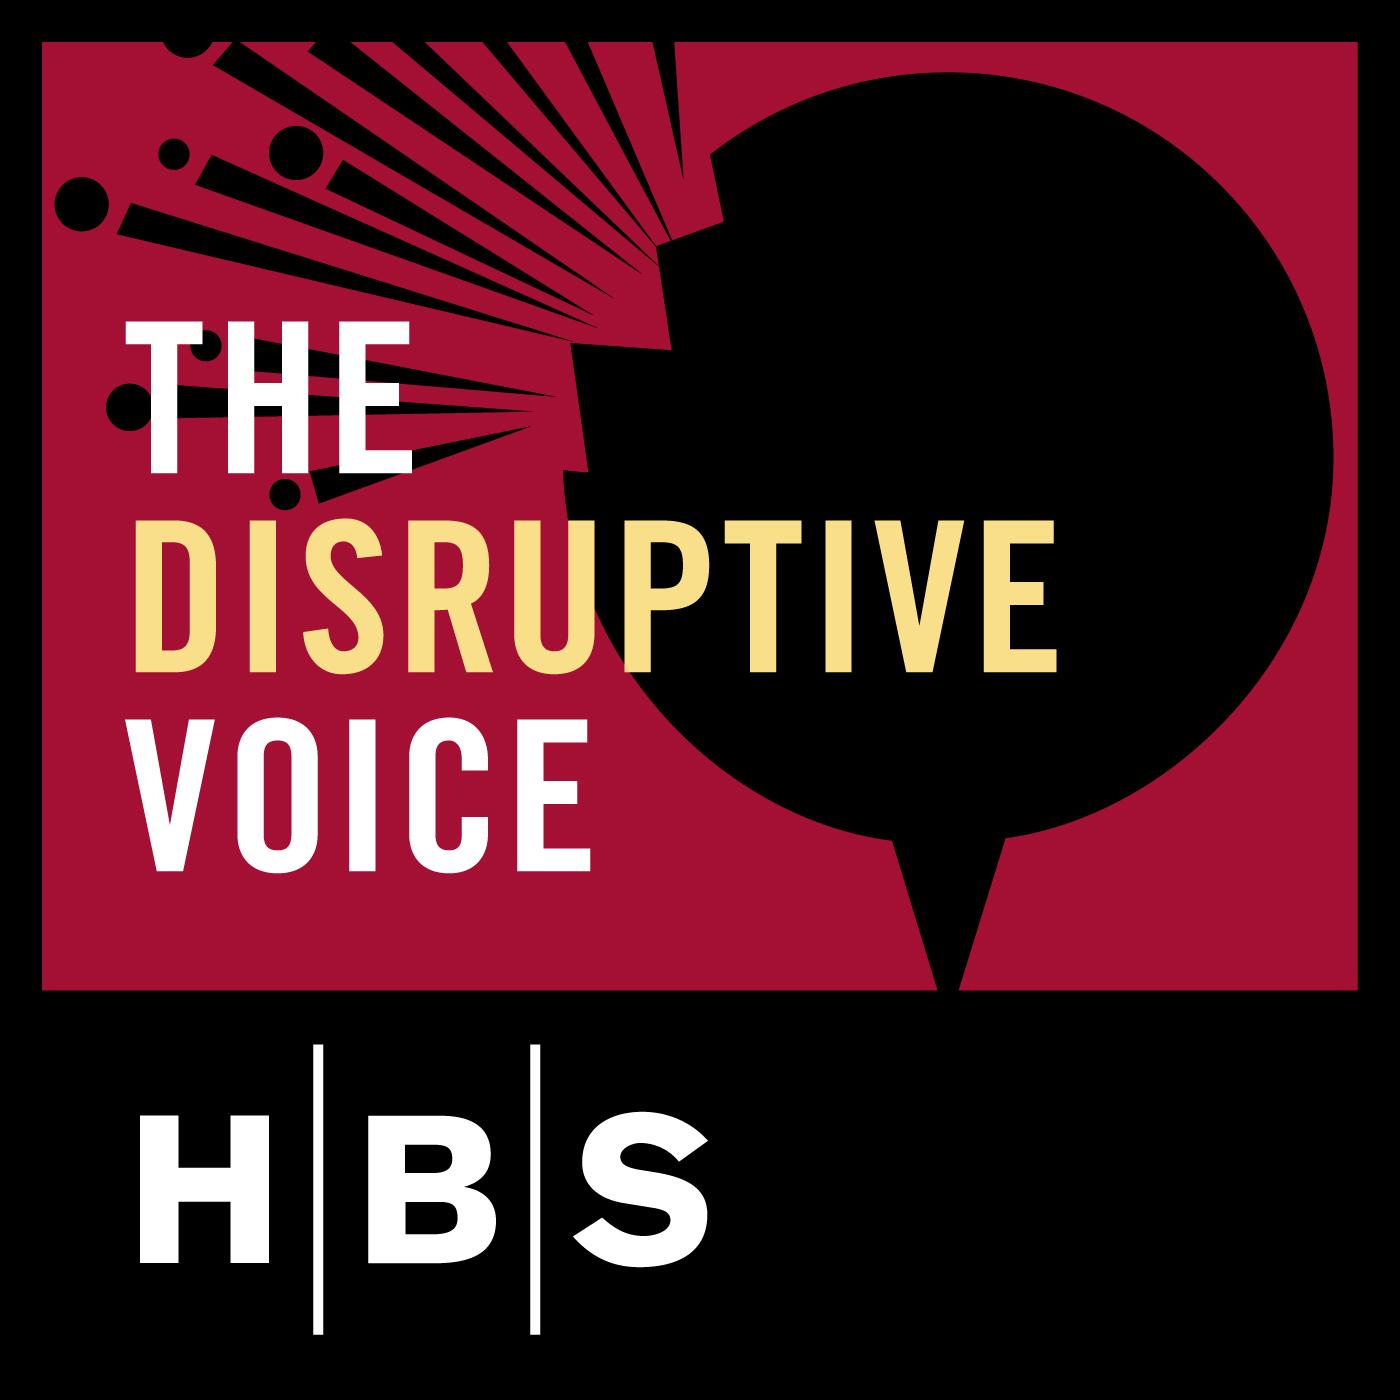 The Disruptive Voice show art